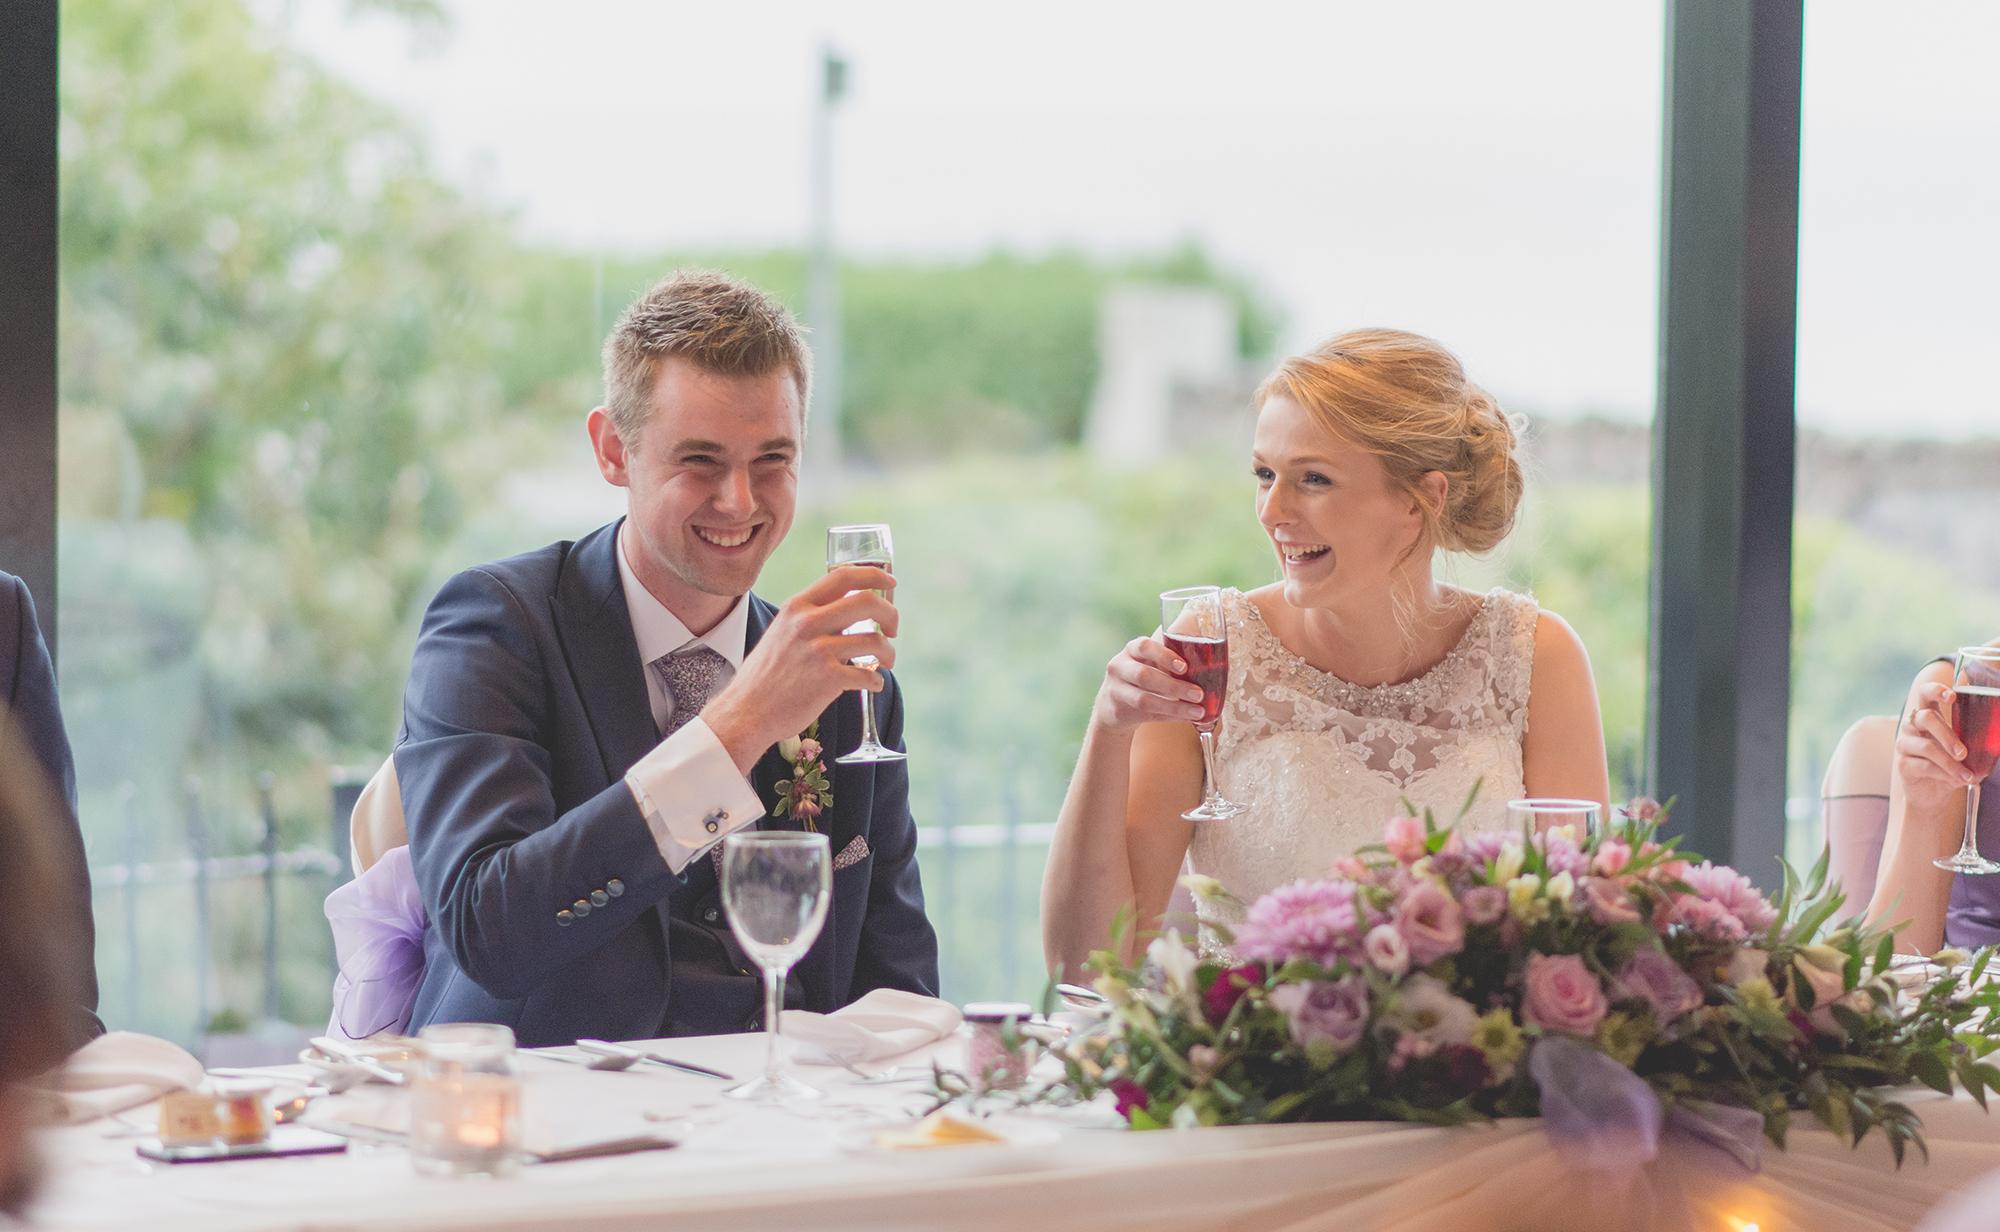 ballygally wedding photography tc photography larne belfast lisburn 11